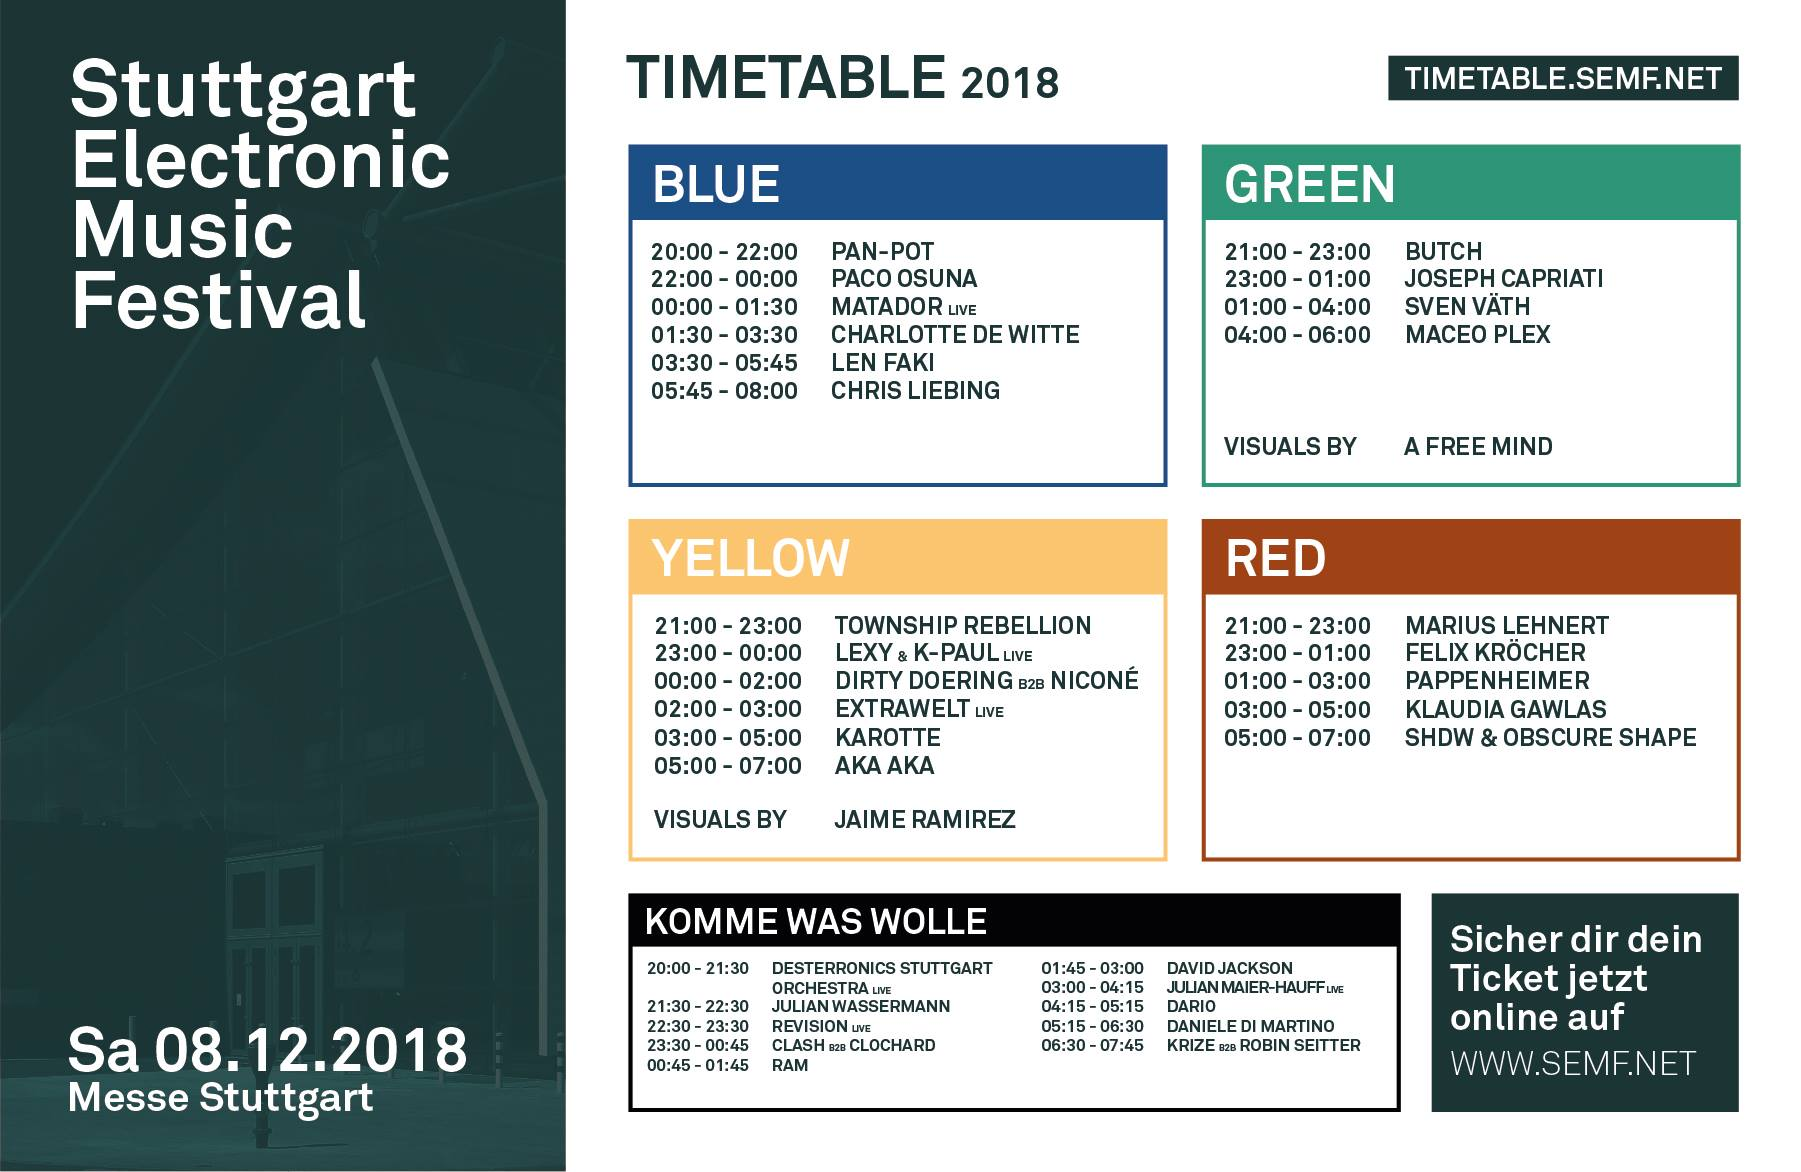 Timetable SEMF 2018